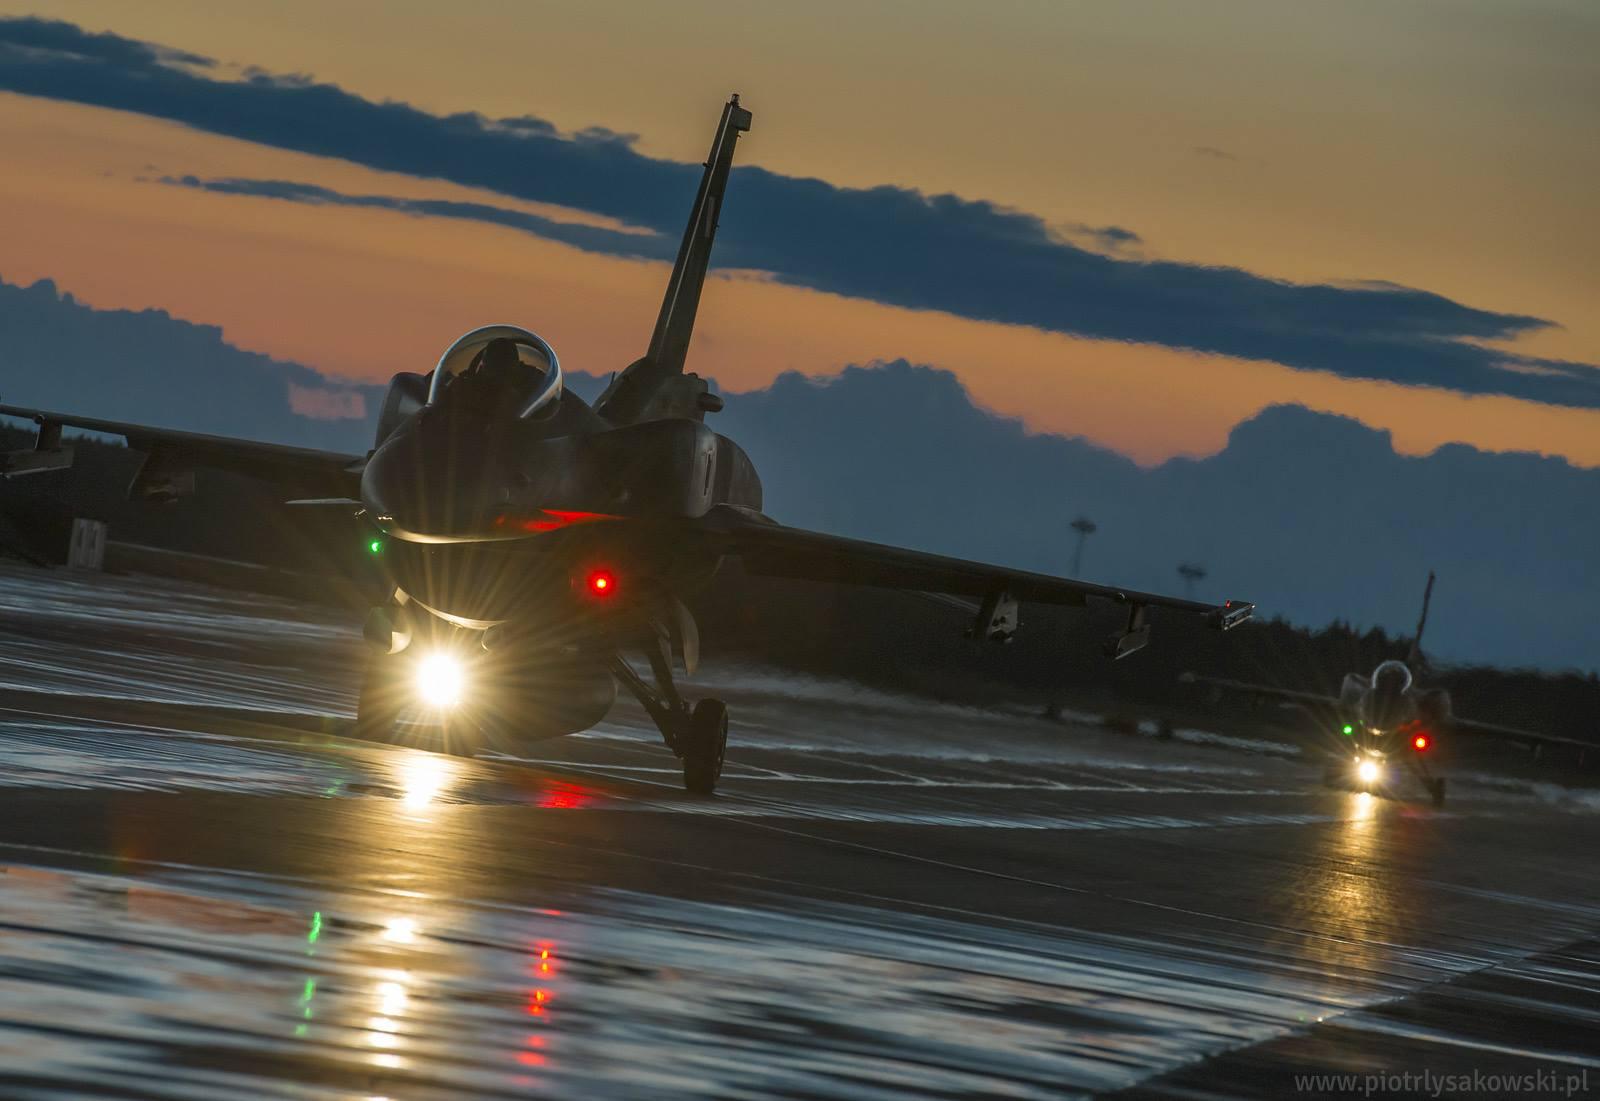 F-16 Fighting Falcon - Page 6 143473_352179760_10623941_760285490695525_2399340556681583669_o